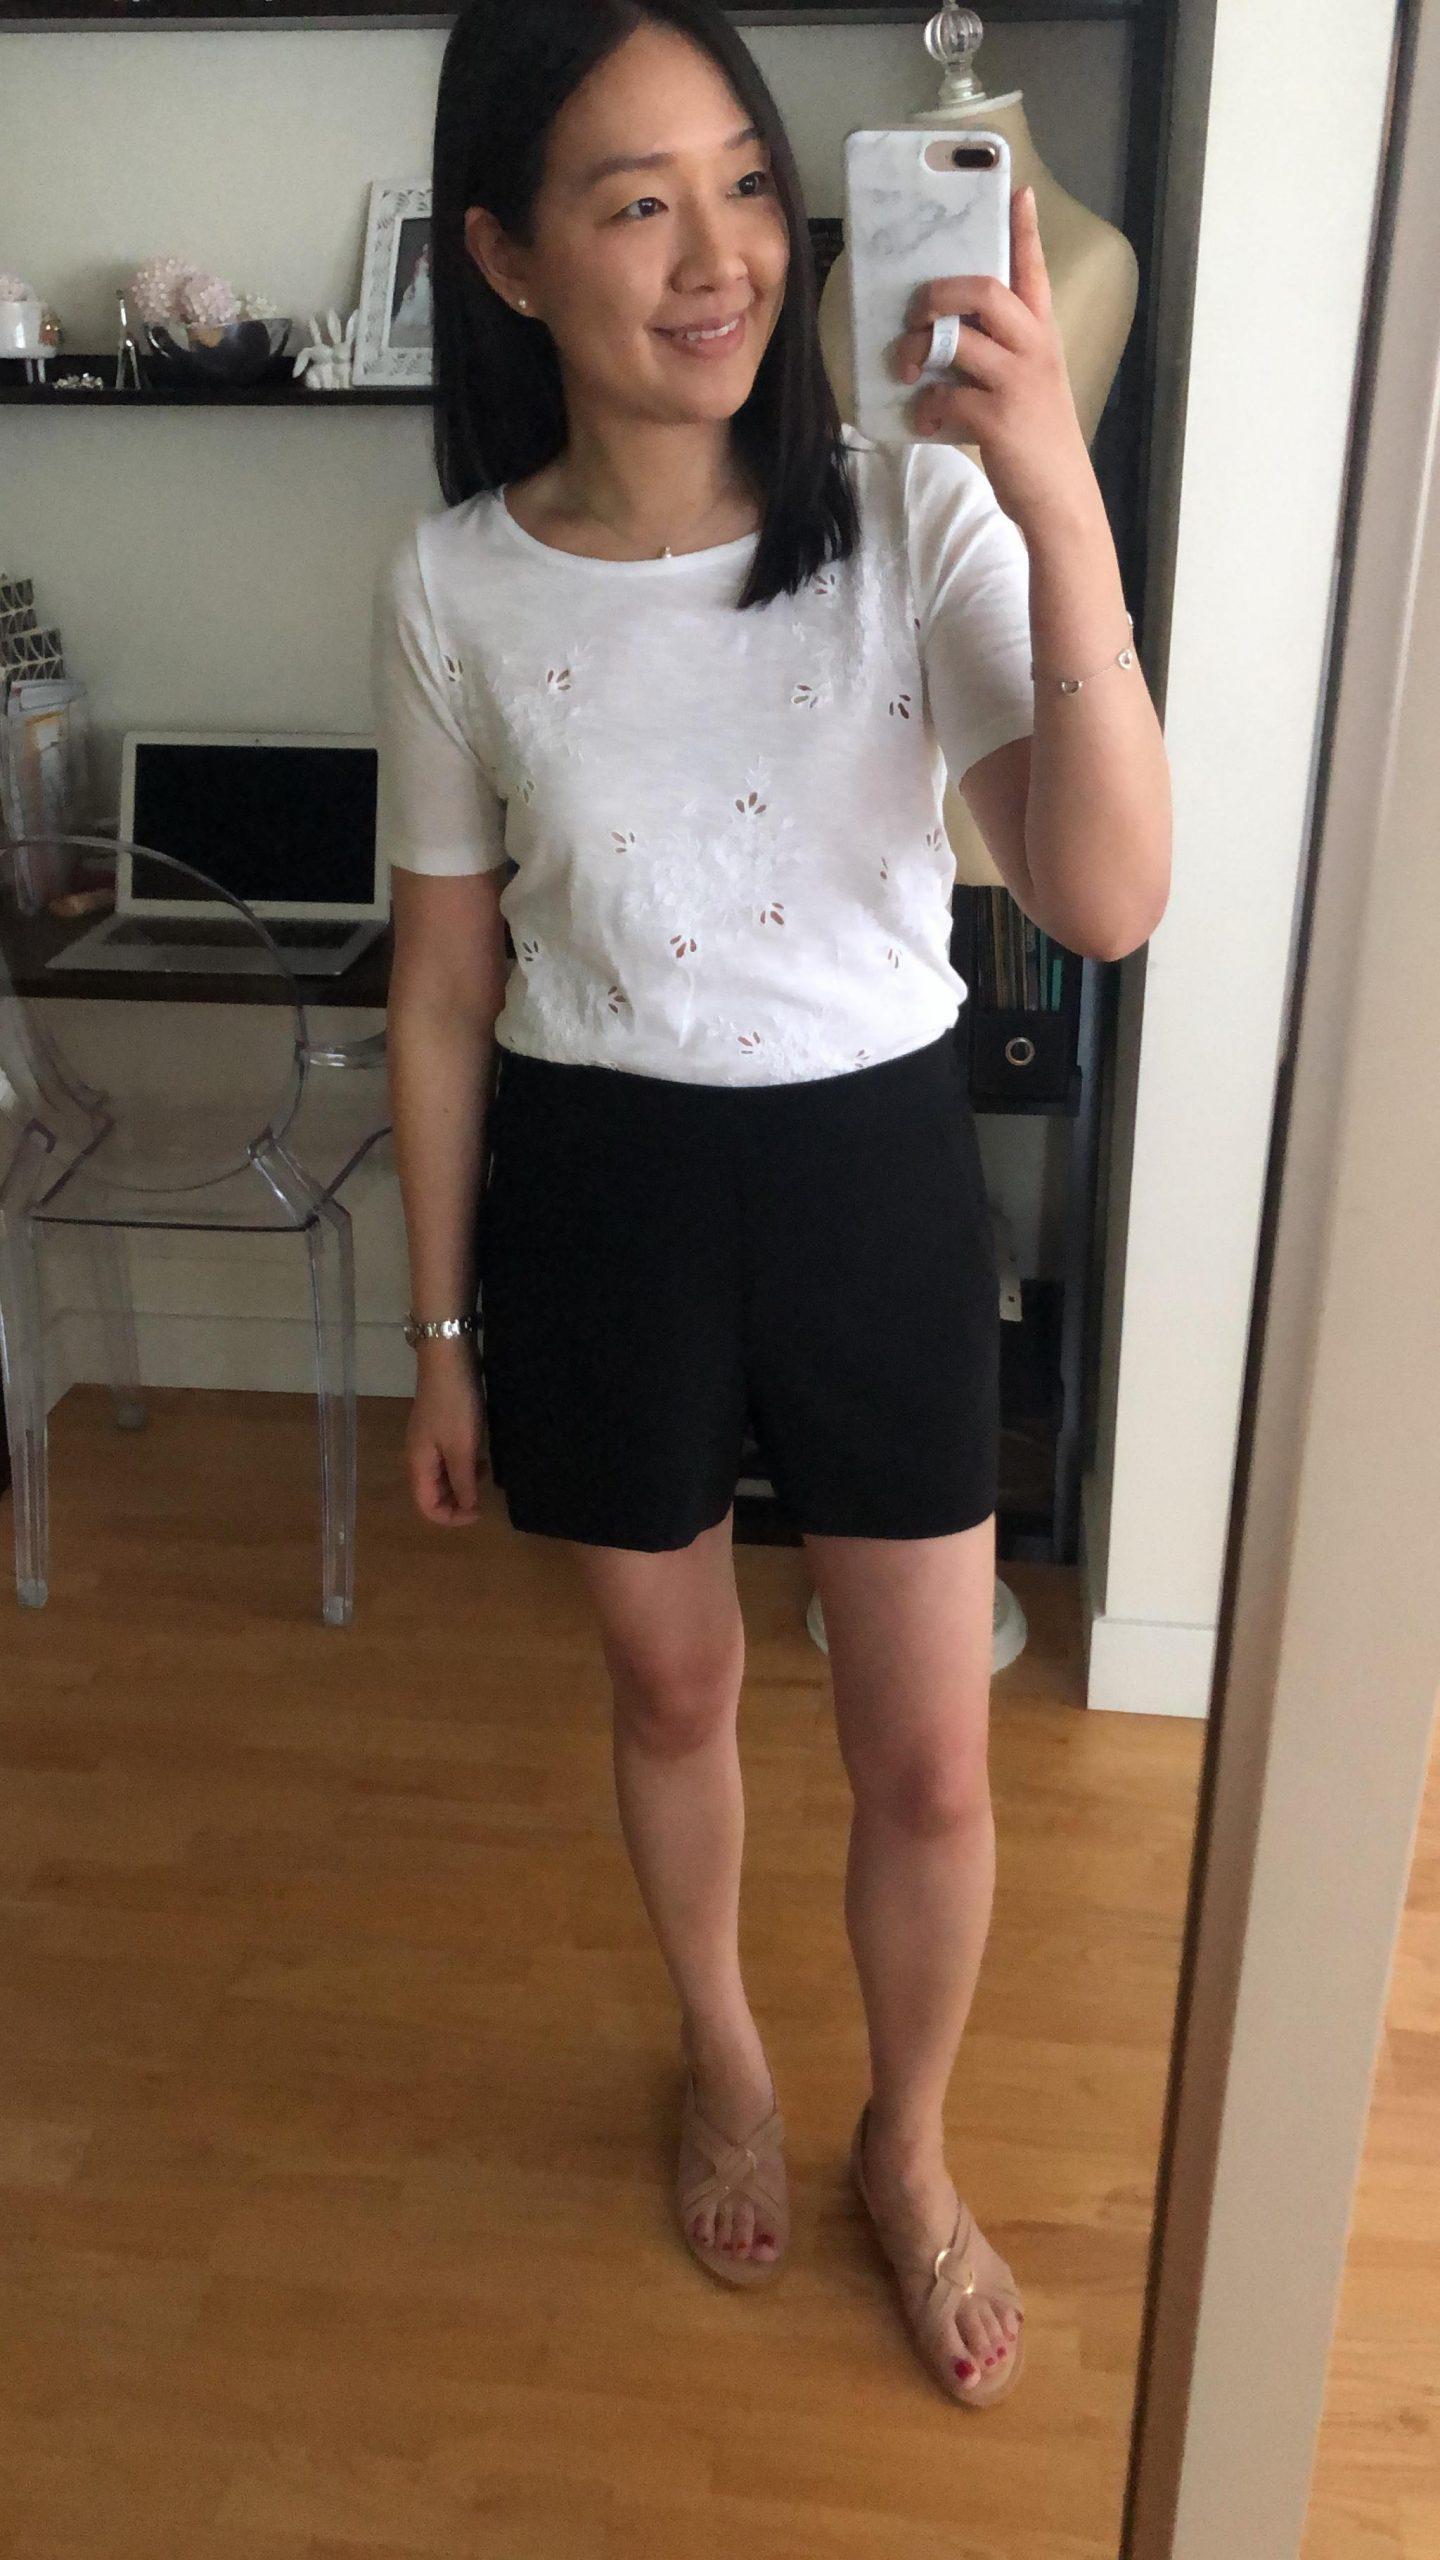 LOFT Crepe Pull On Shorts, size XXS regular